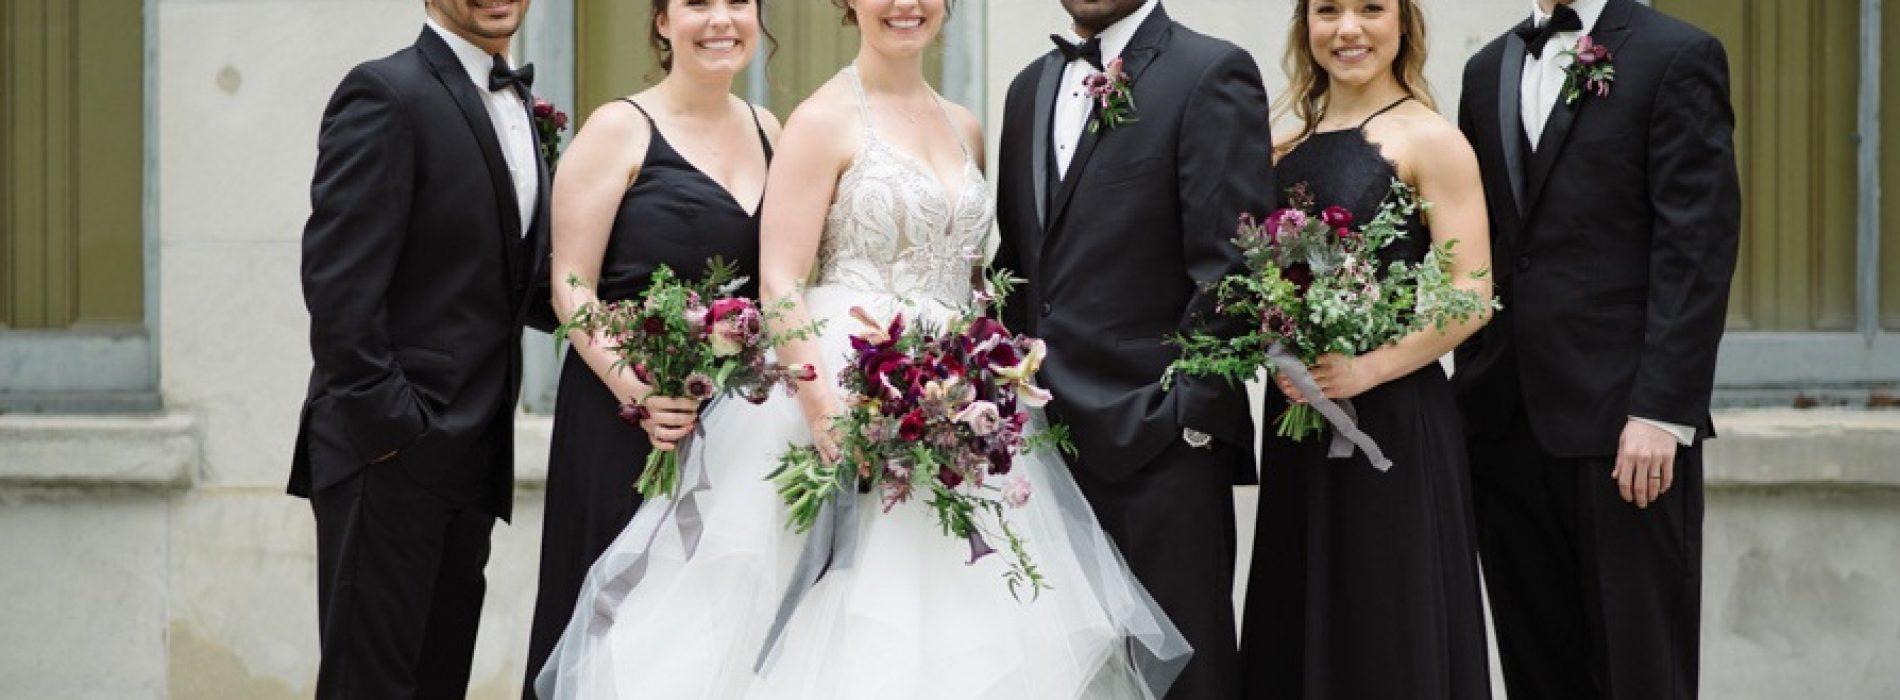 Wedding Planning – Selecting Your Wedding Dress